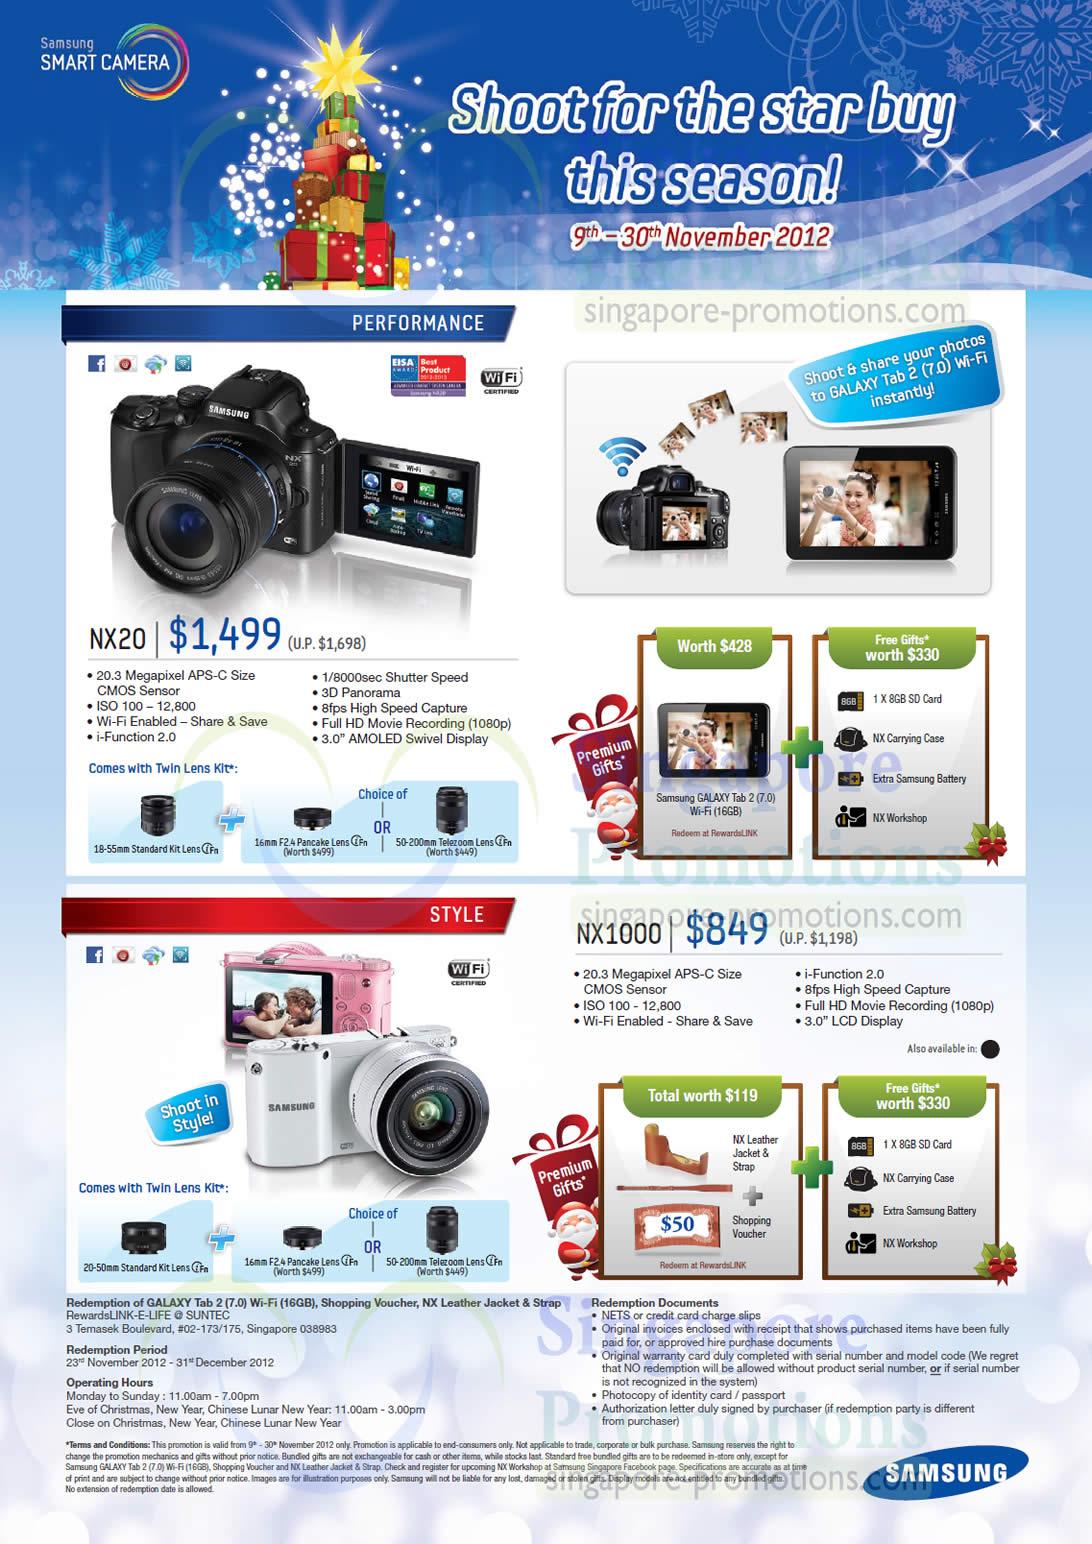 Digital Cameras NX20, NX1000